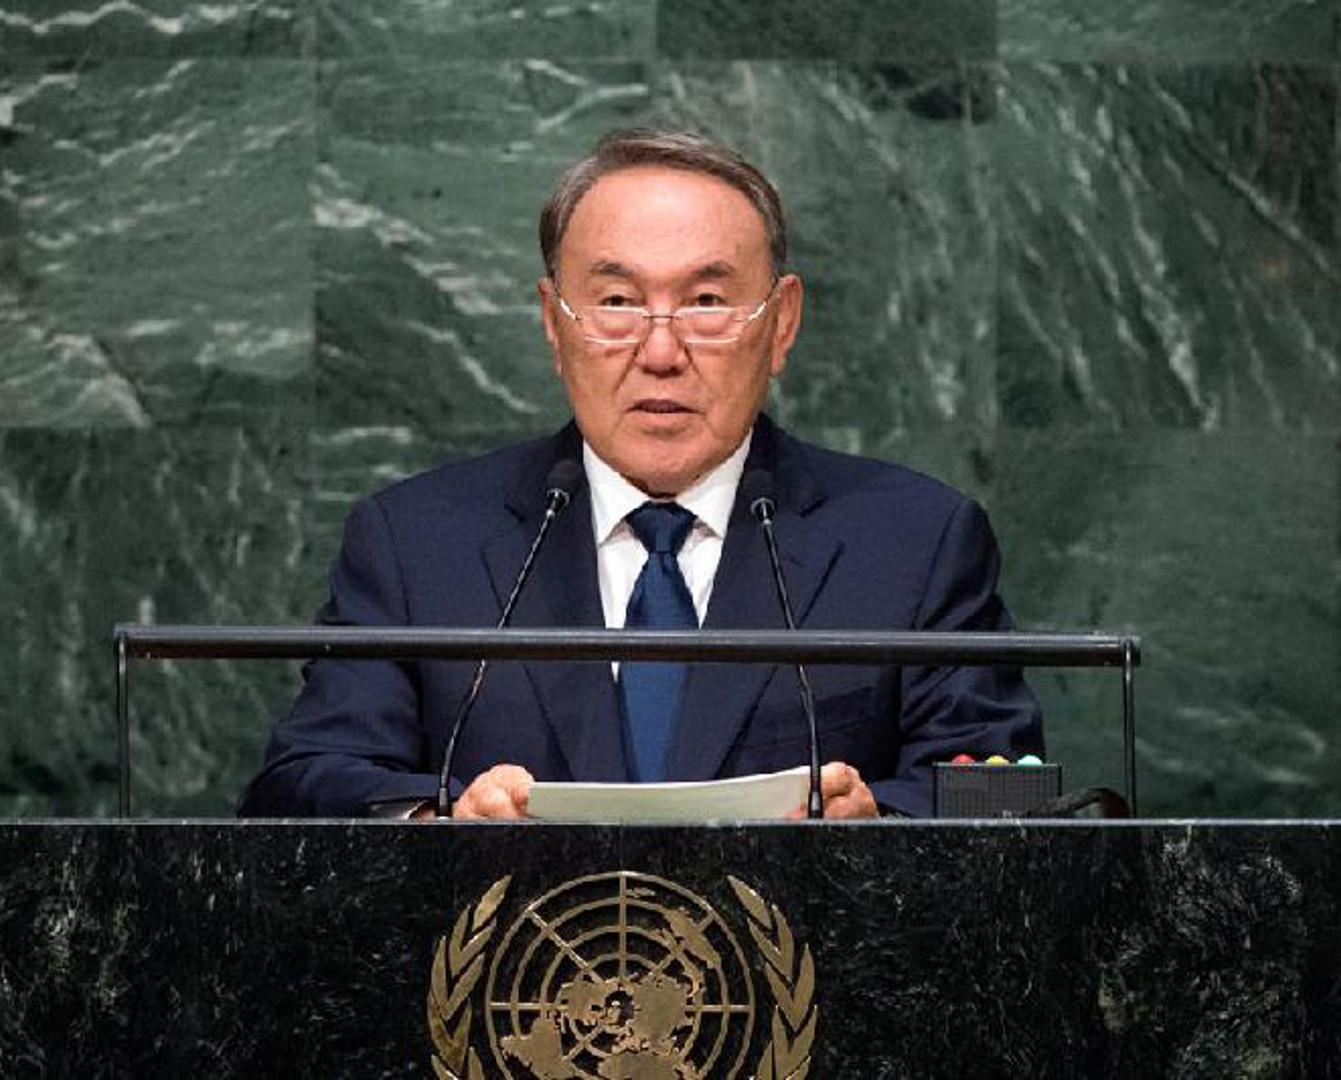 Nursultan Nazarbayev to address UN Security Council meeting